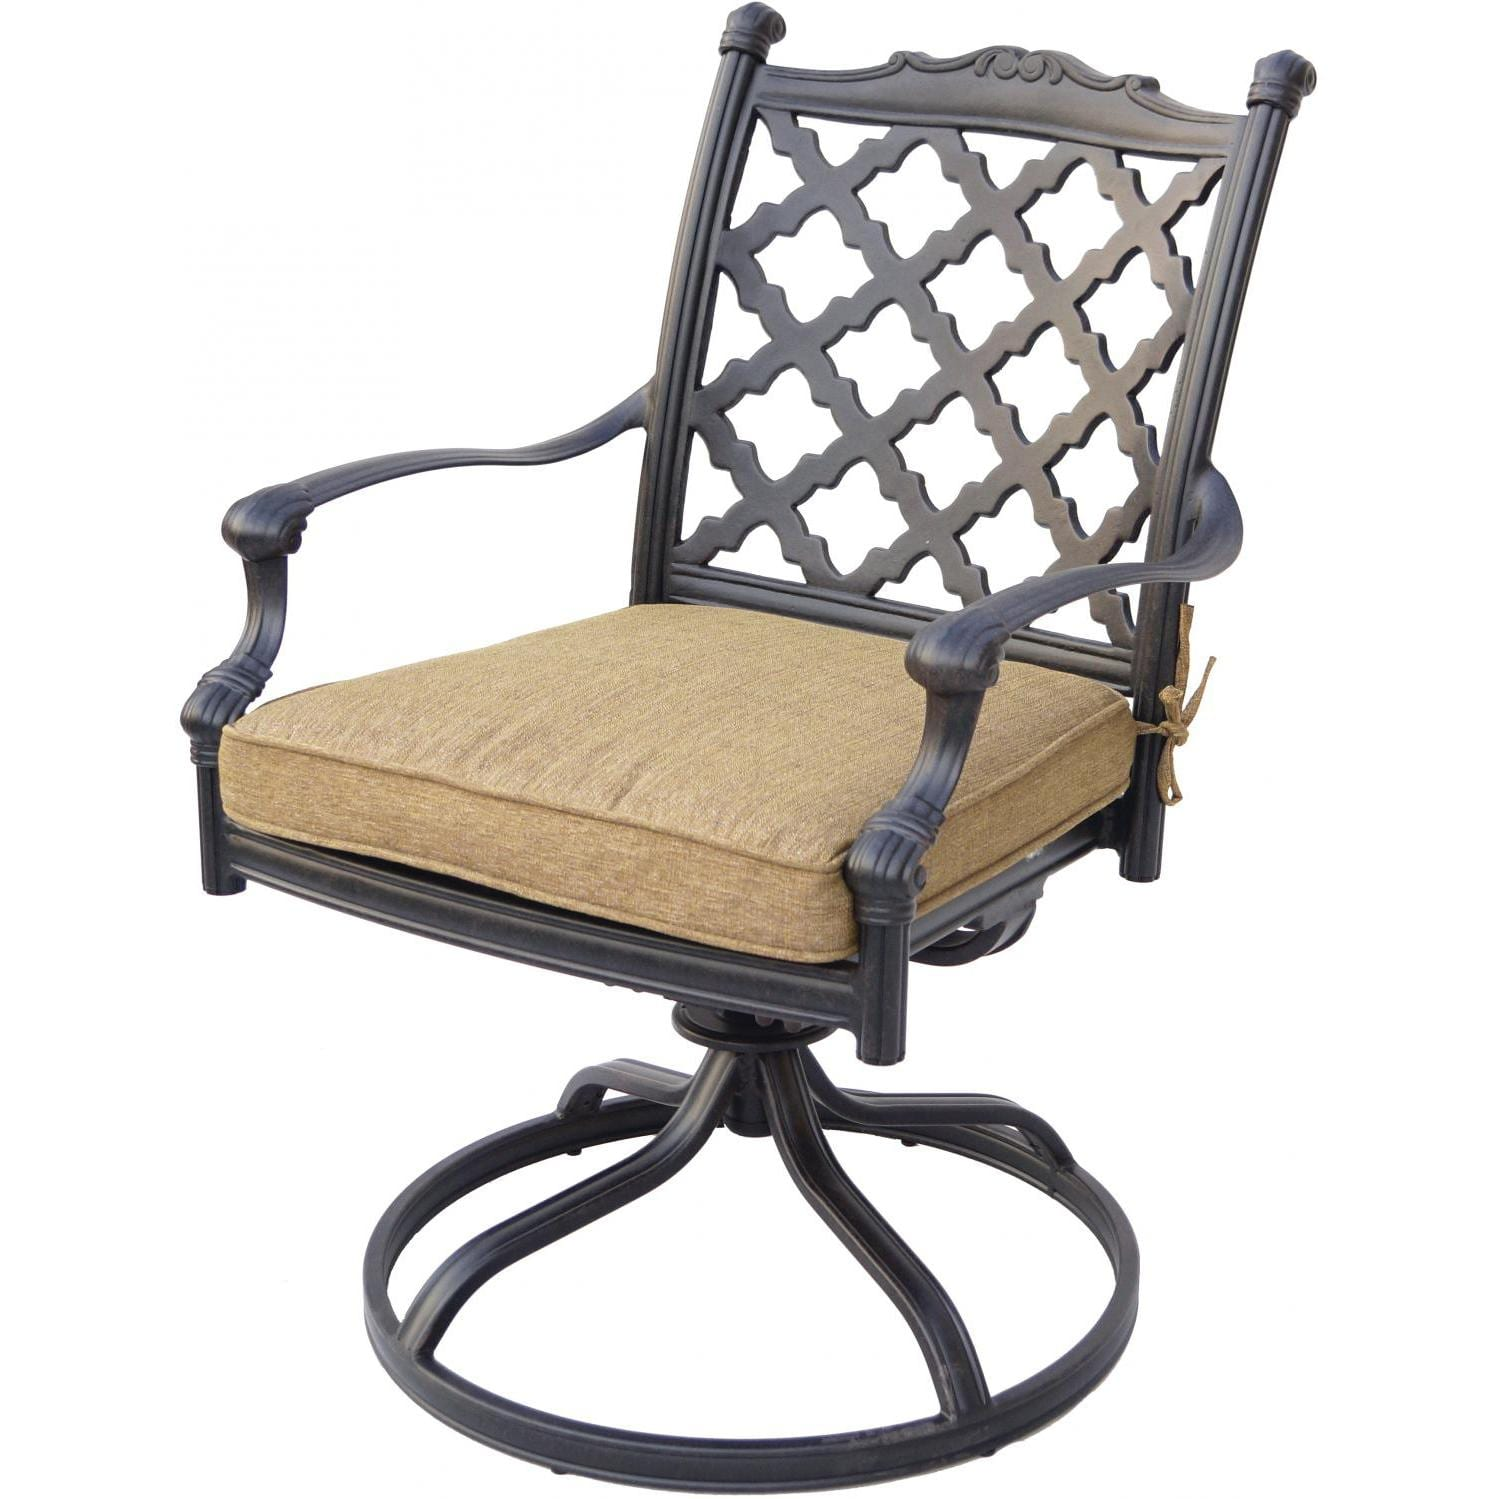 Darlee Camino Real Patio Swivel Rocker Dining Chair